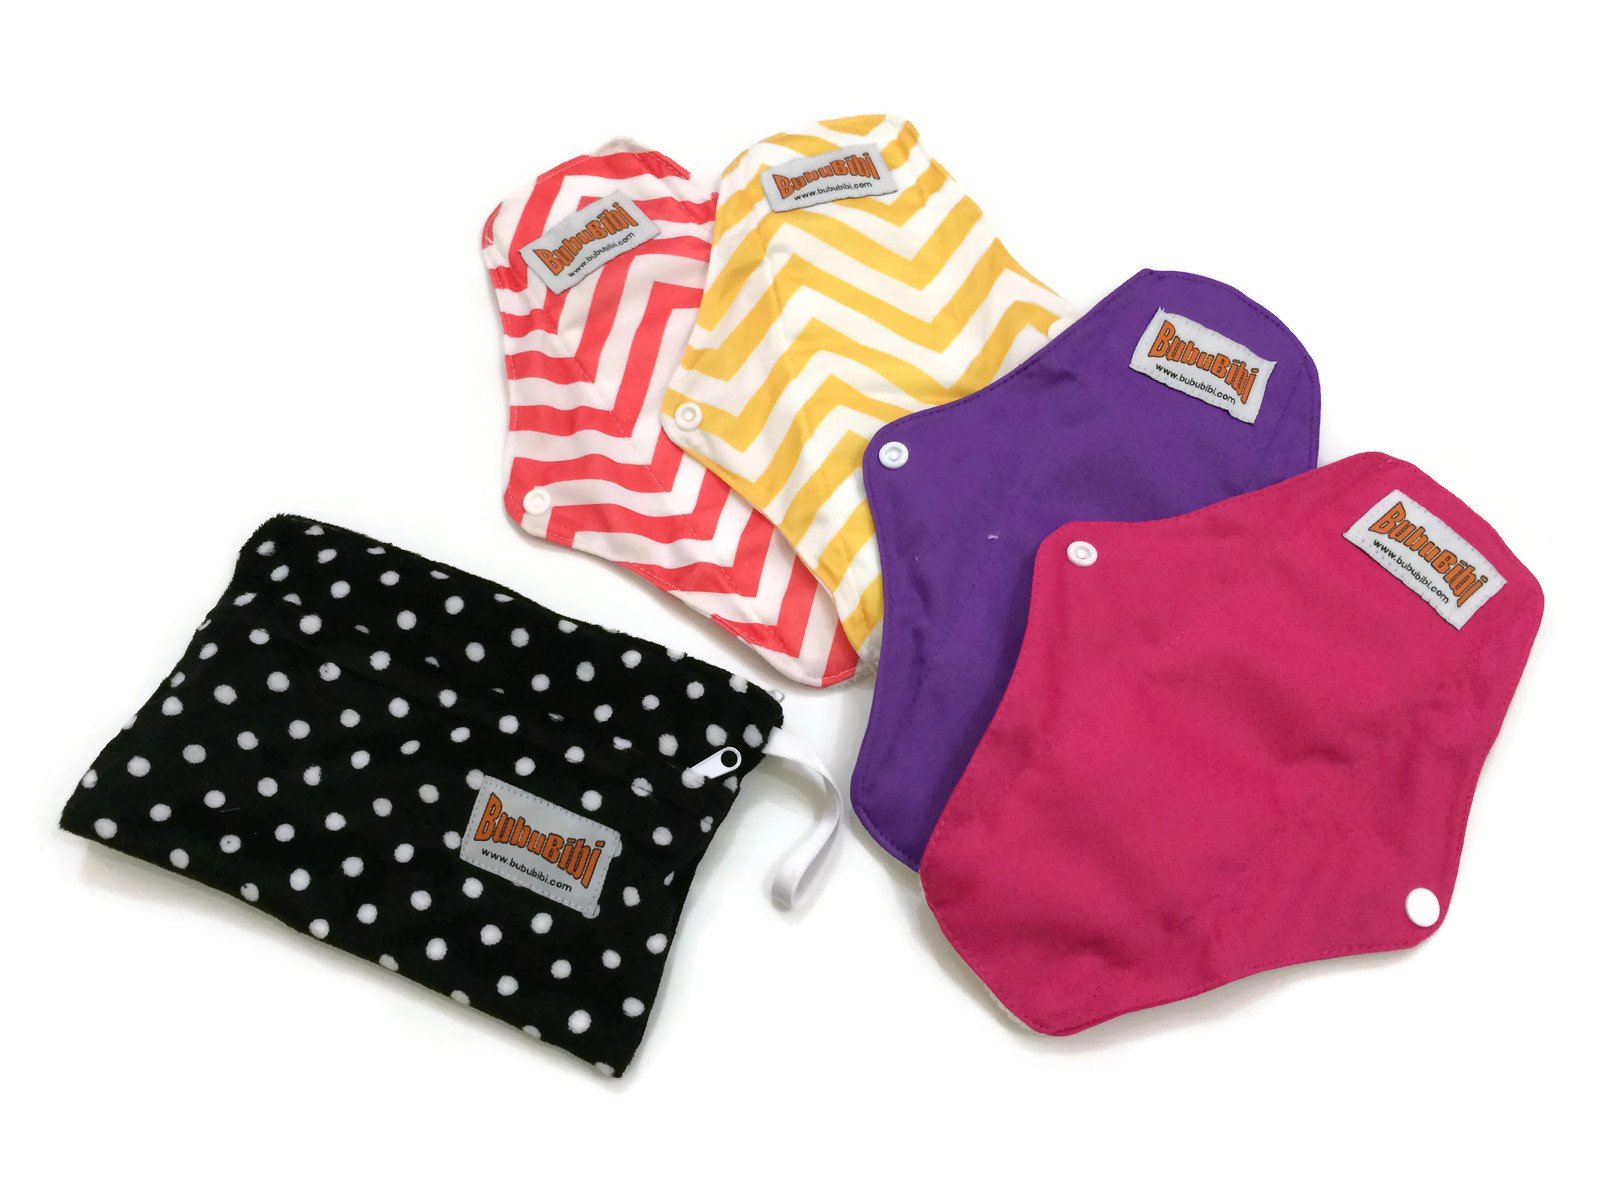 BubuBibi 2 Regular 2 Maxi Bamboo Mama Cloths Menstrual Pads FREE Bag TRIAL PACK